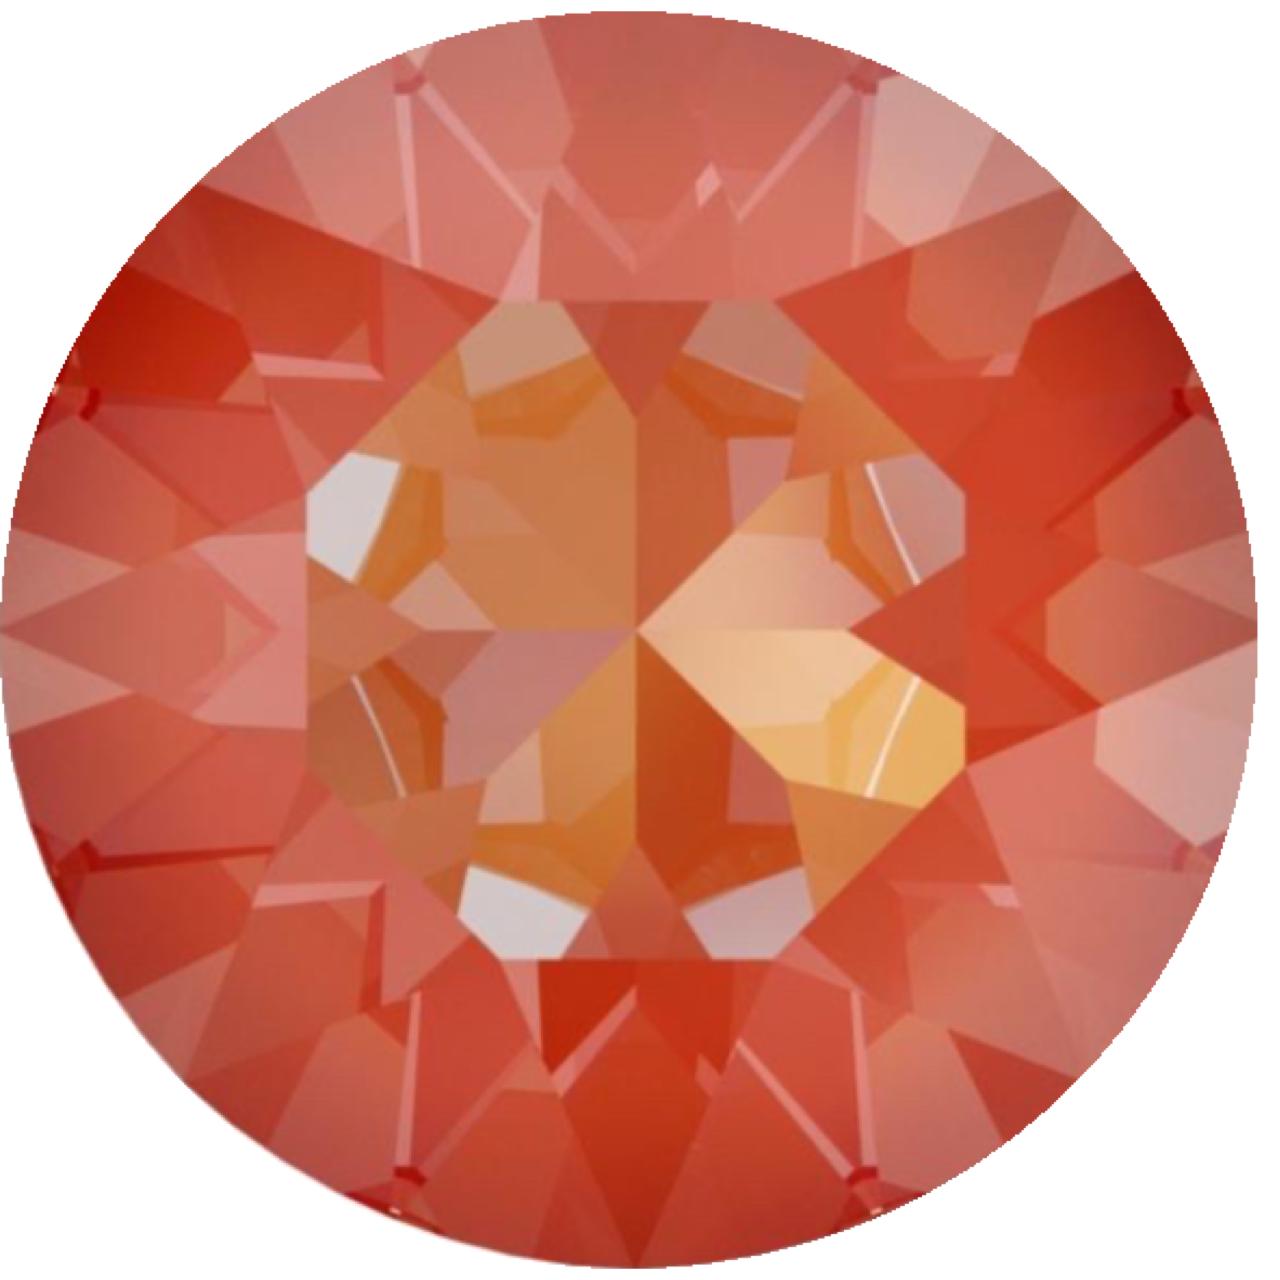 Rhinestone - Orange Glow DeLite